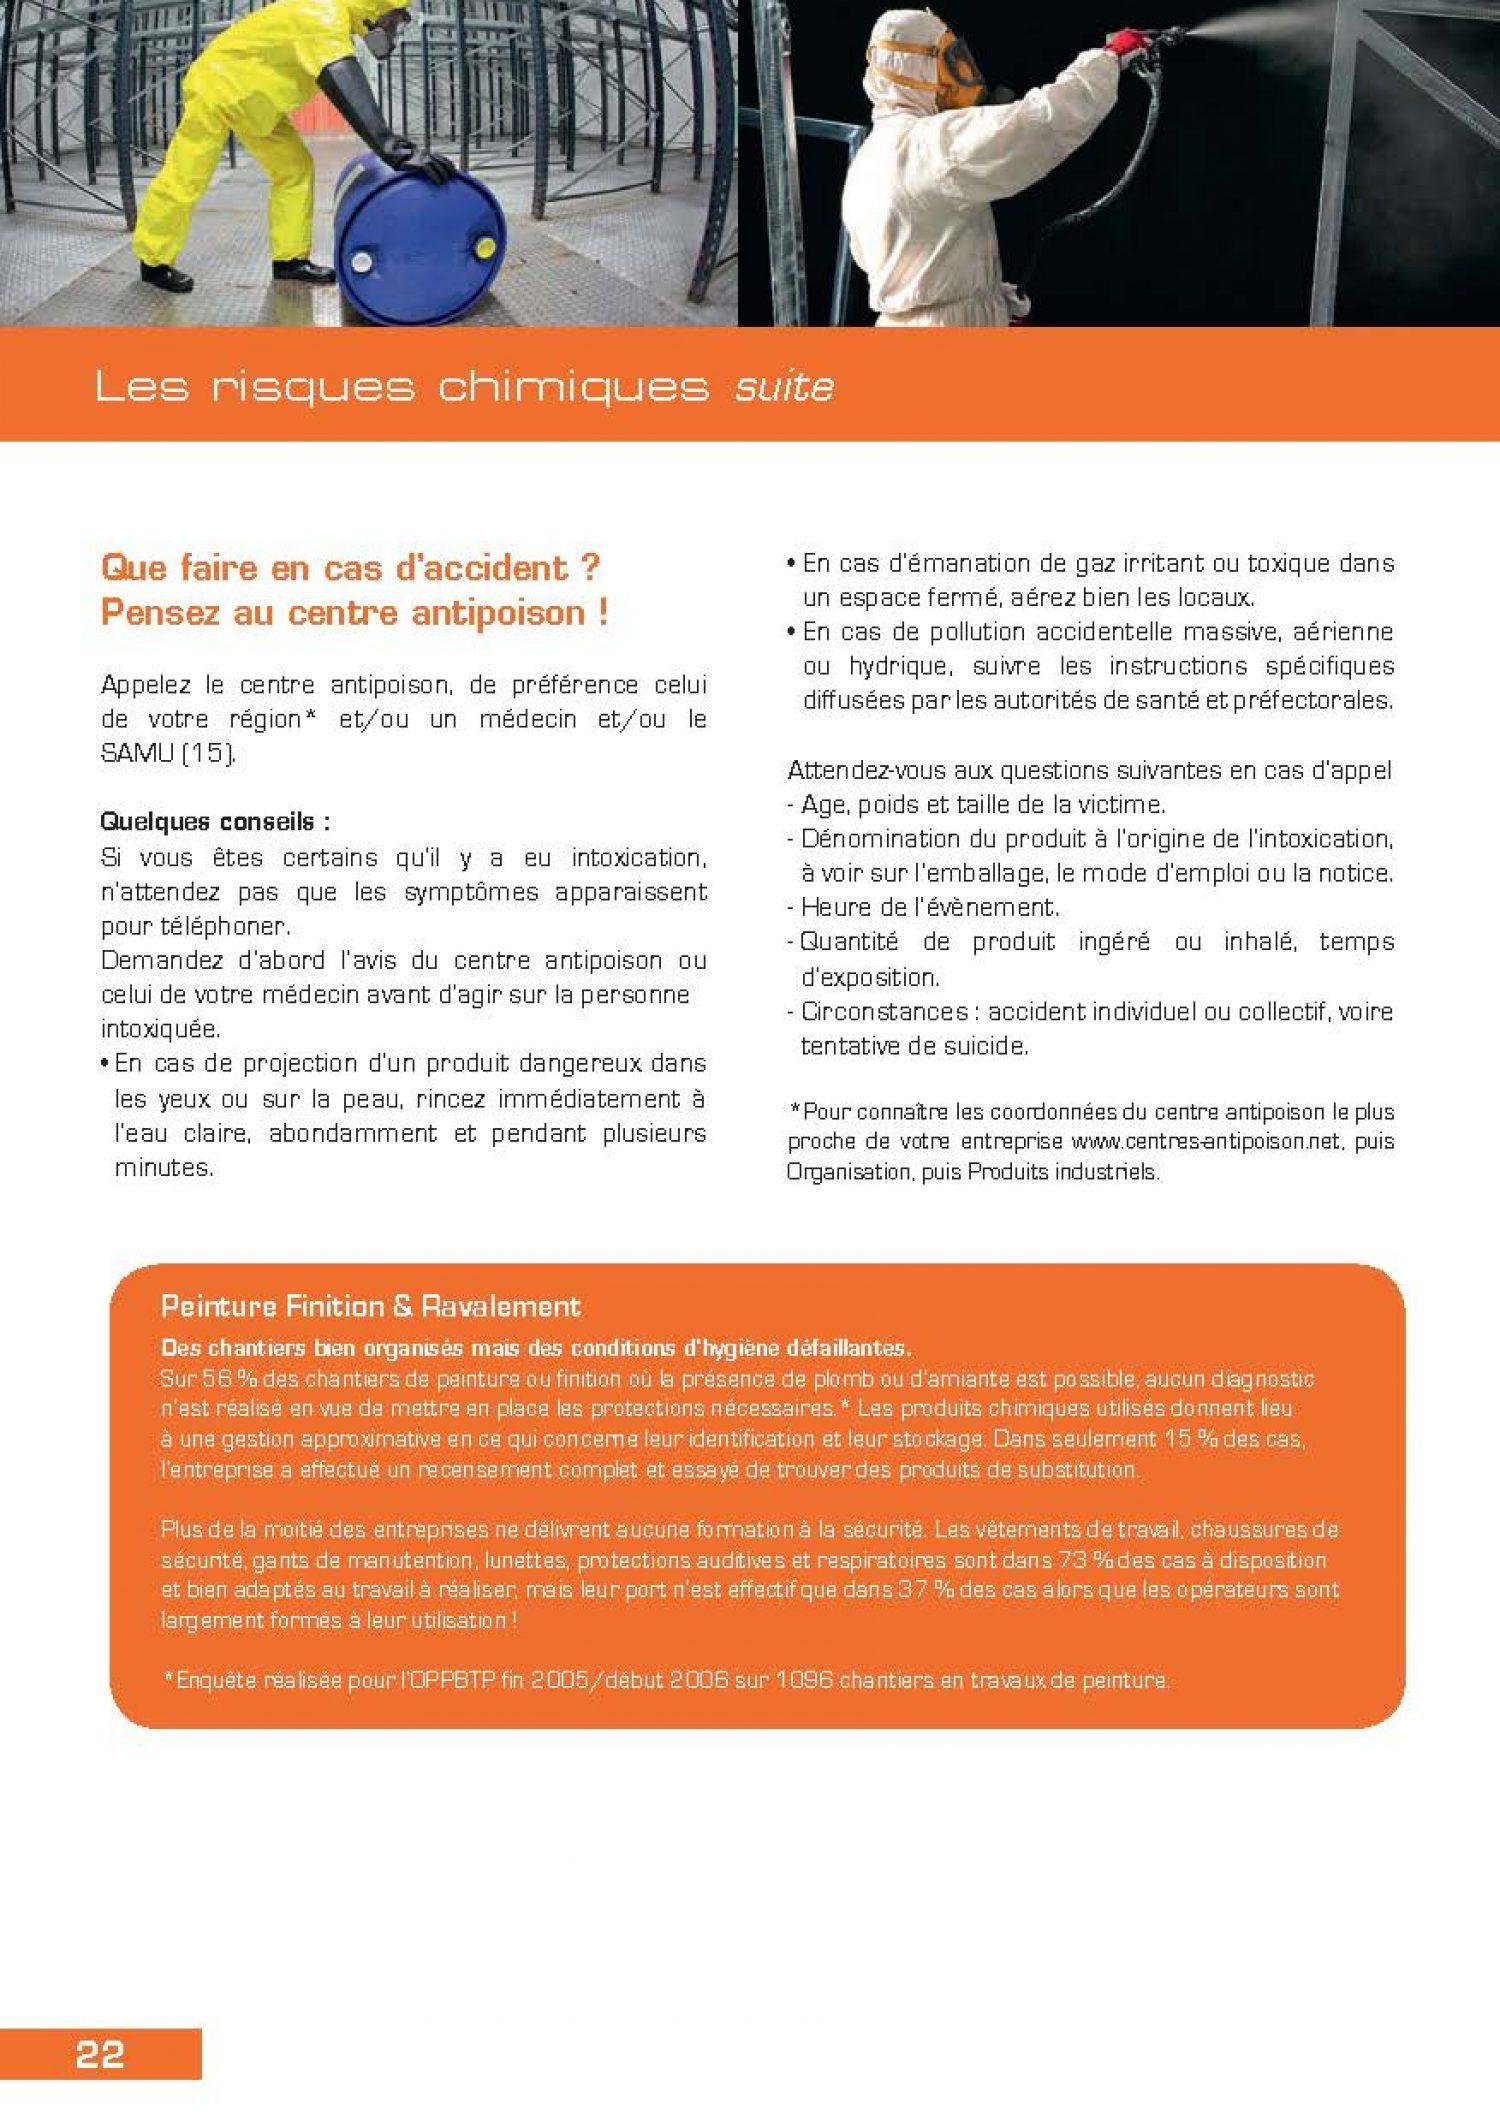 Guide Securite au Travail 2014 HDpdf_Page_22